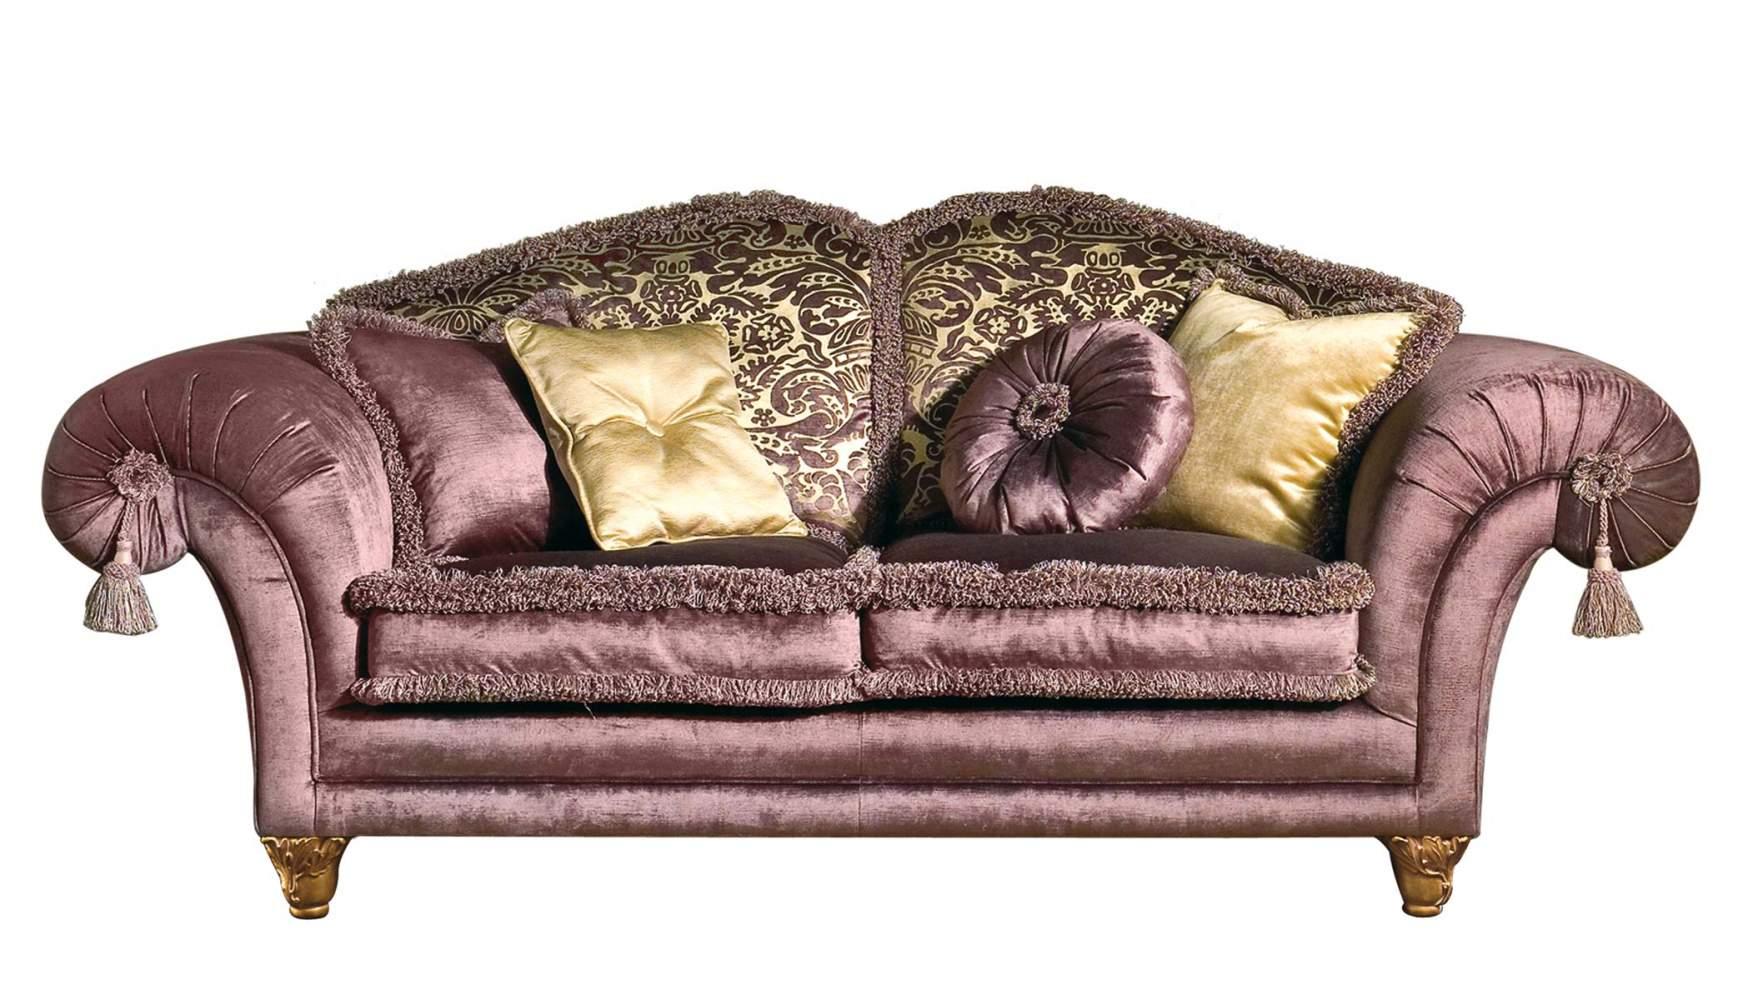 classic sofa majestic vimercati classic furniture. Black Bedroom Furniture Sets. Home Design Ideas